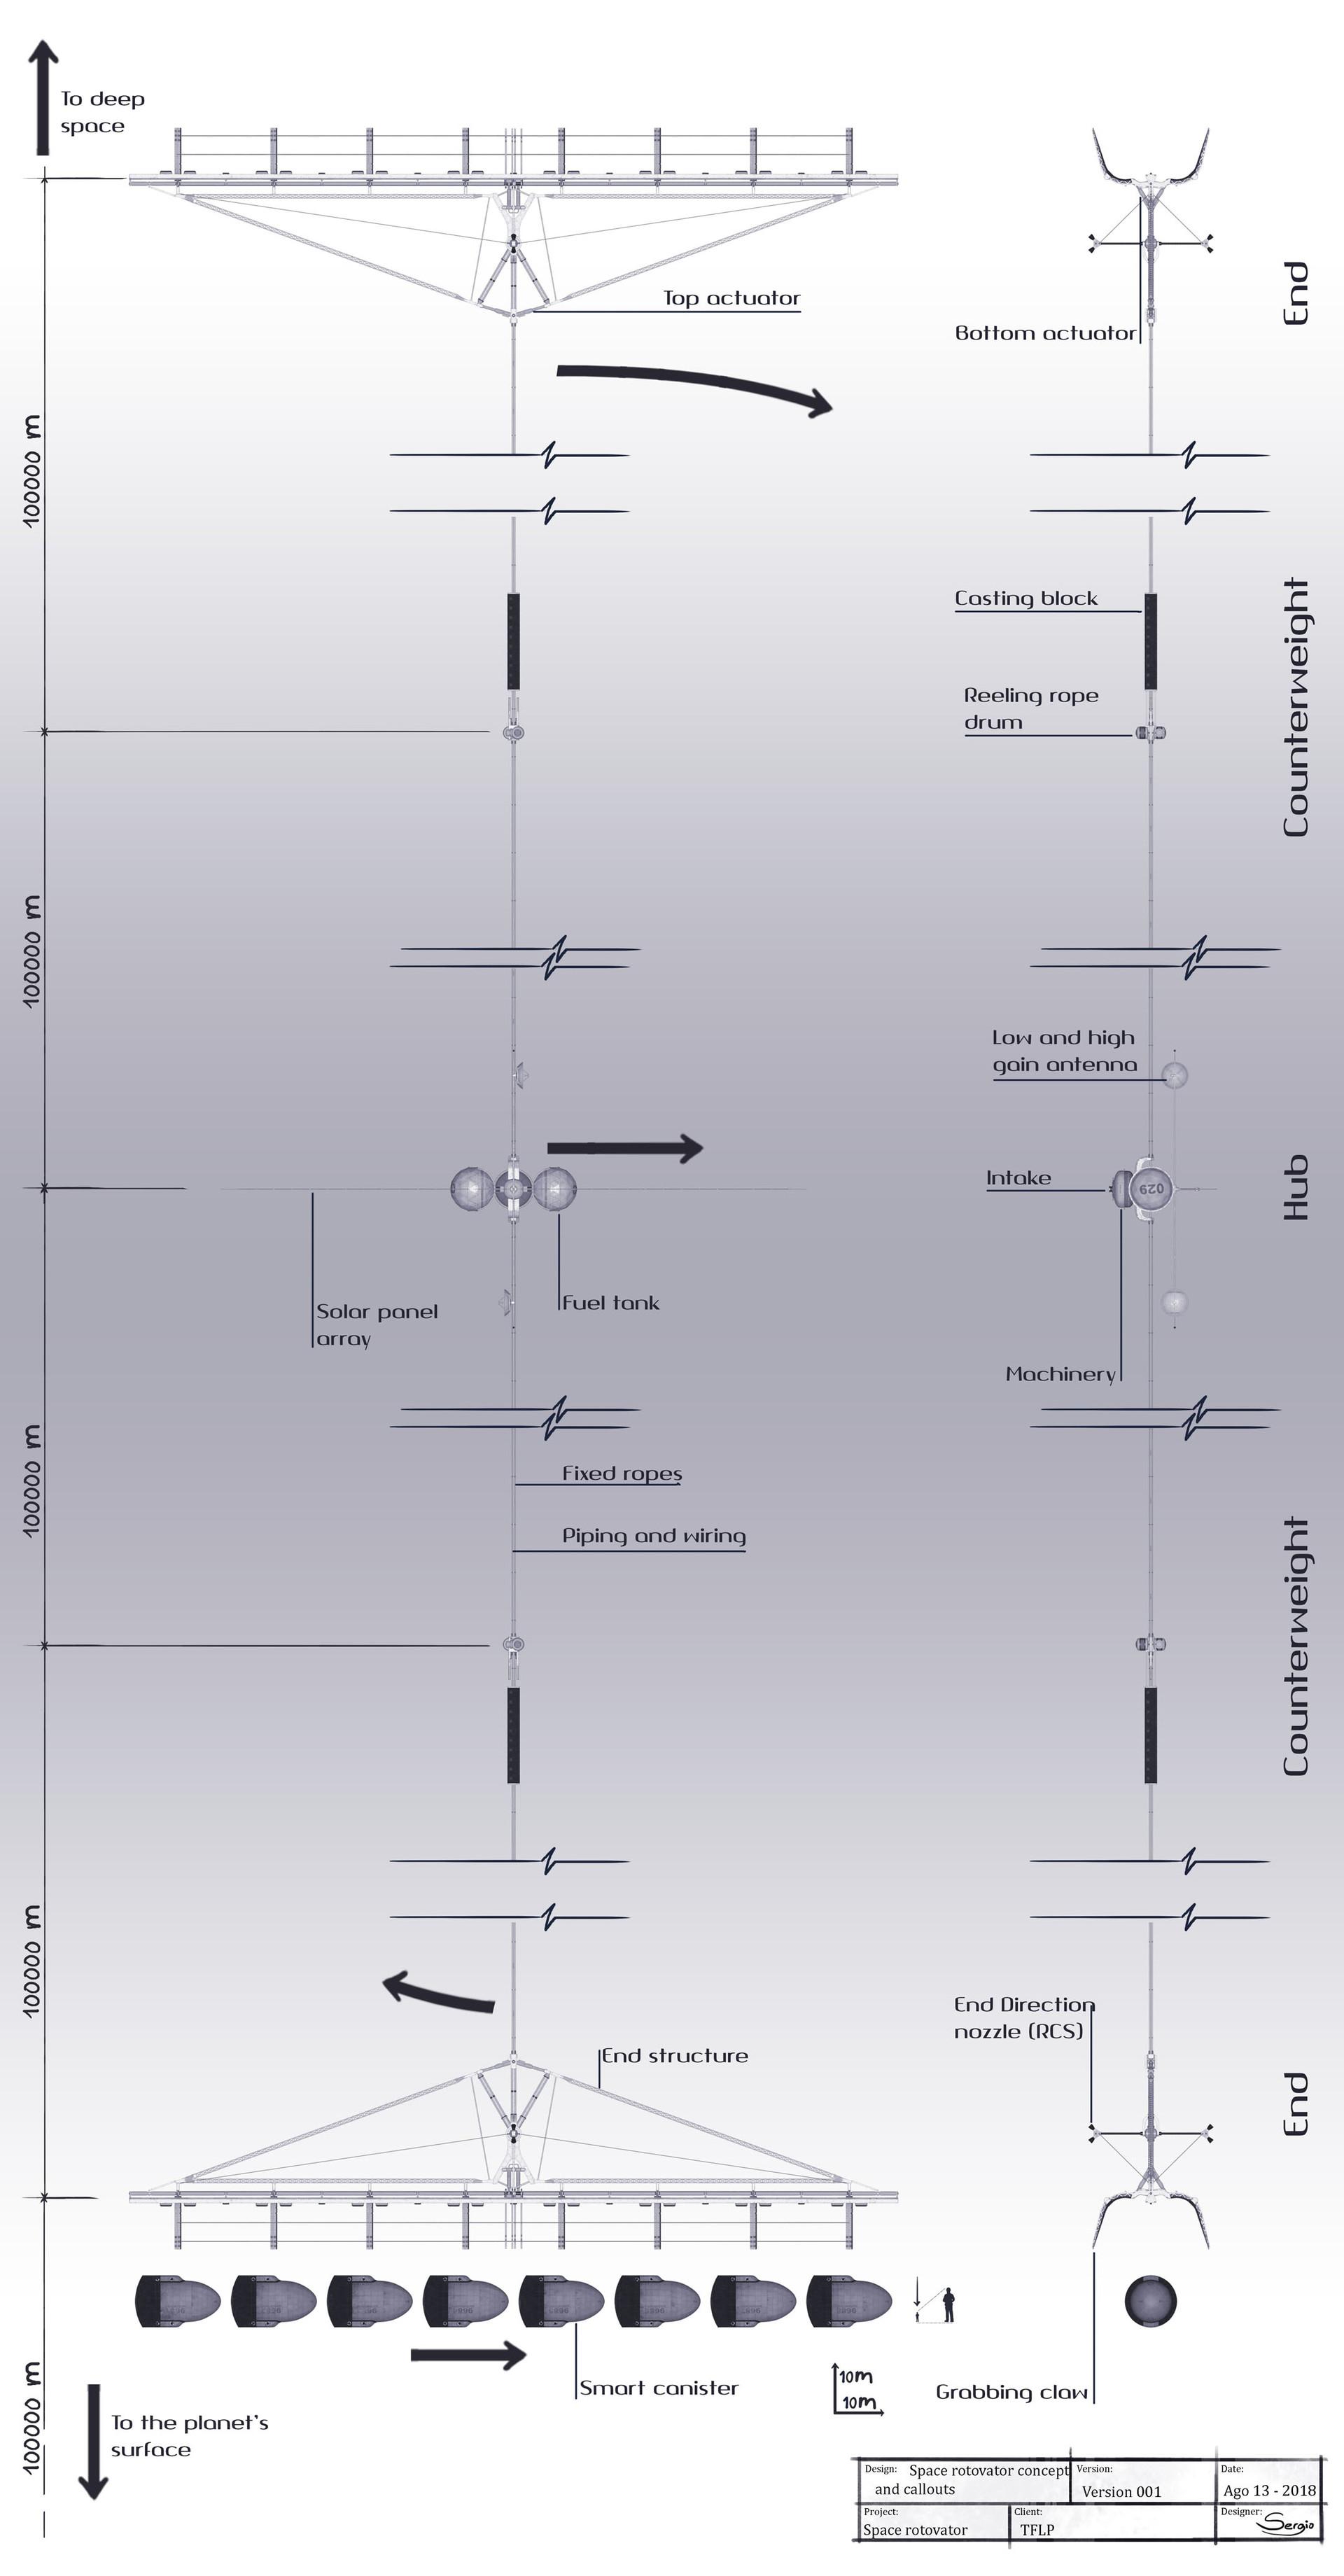 Sergio botero tflp rotovator concept